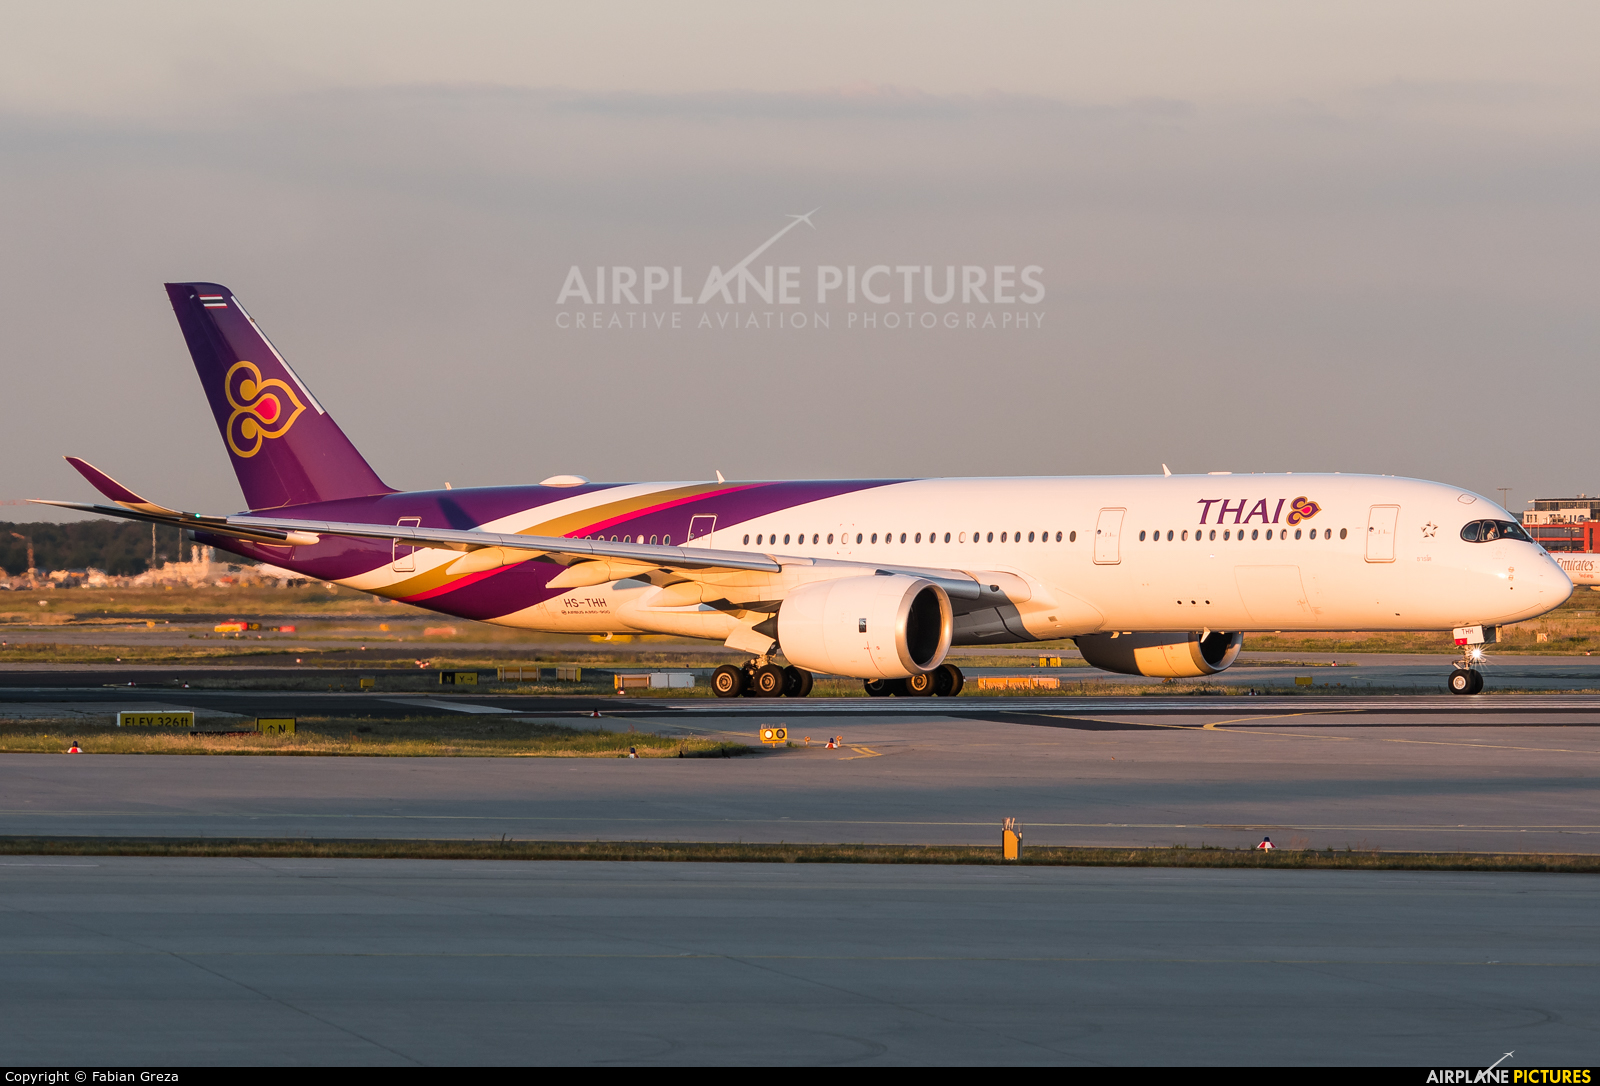 Thai Airways HS-THH aircraft at Frankfurt